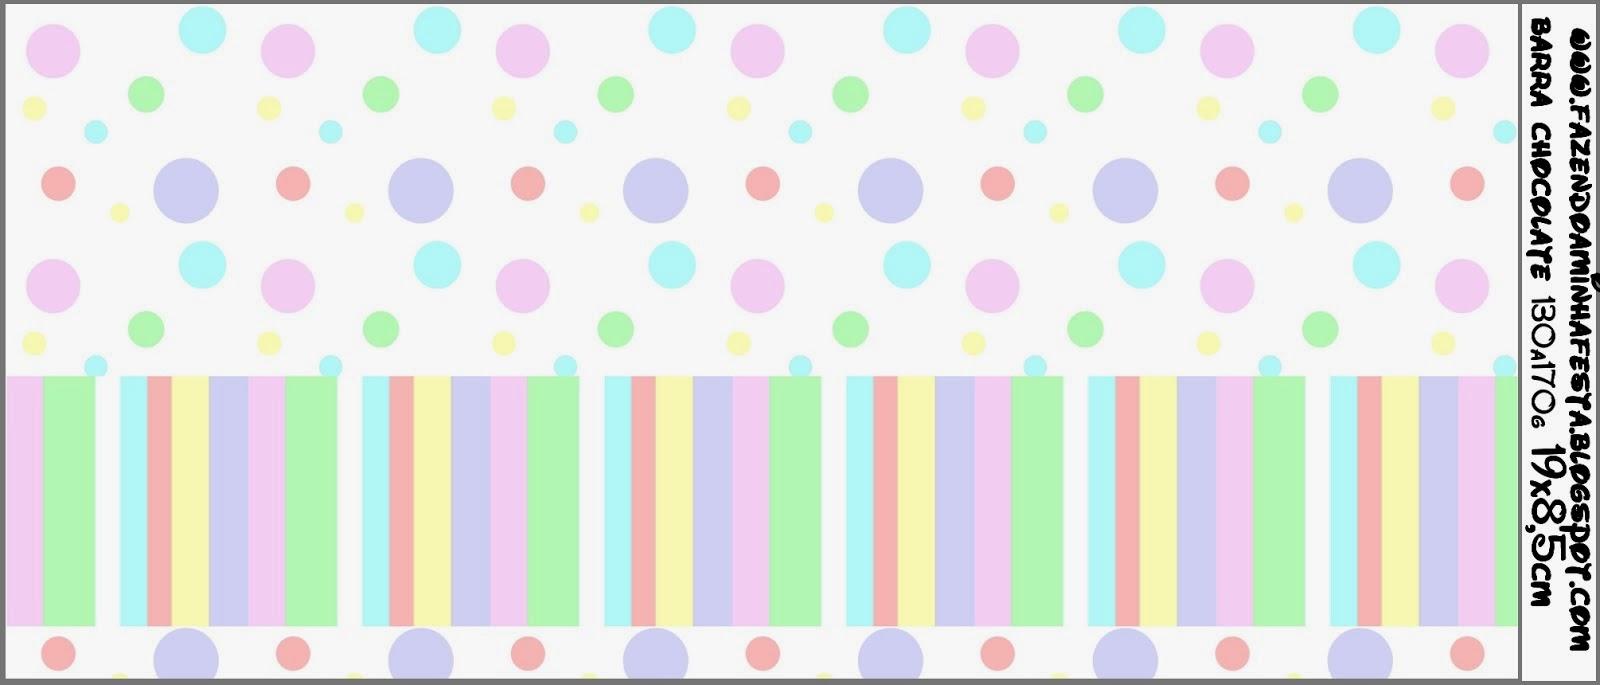 Lunares De Colores Pastel: Etiquetas Para Imprimir Gratis